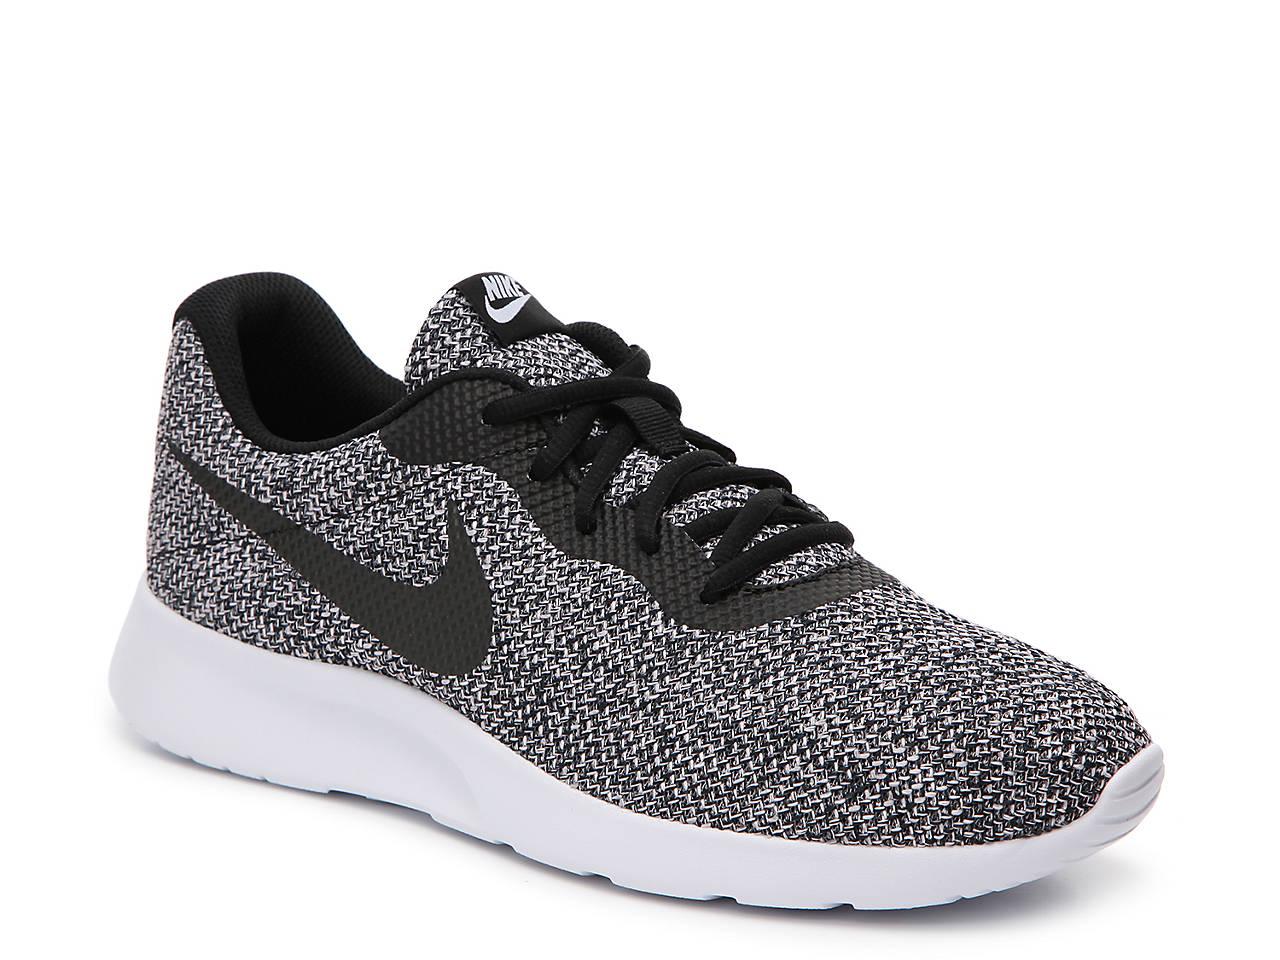 cbc8af6db2123 Nike Tanjun Sneaker - Men's Men's Shoes | DSW